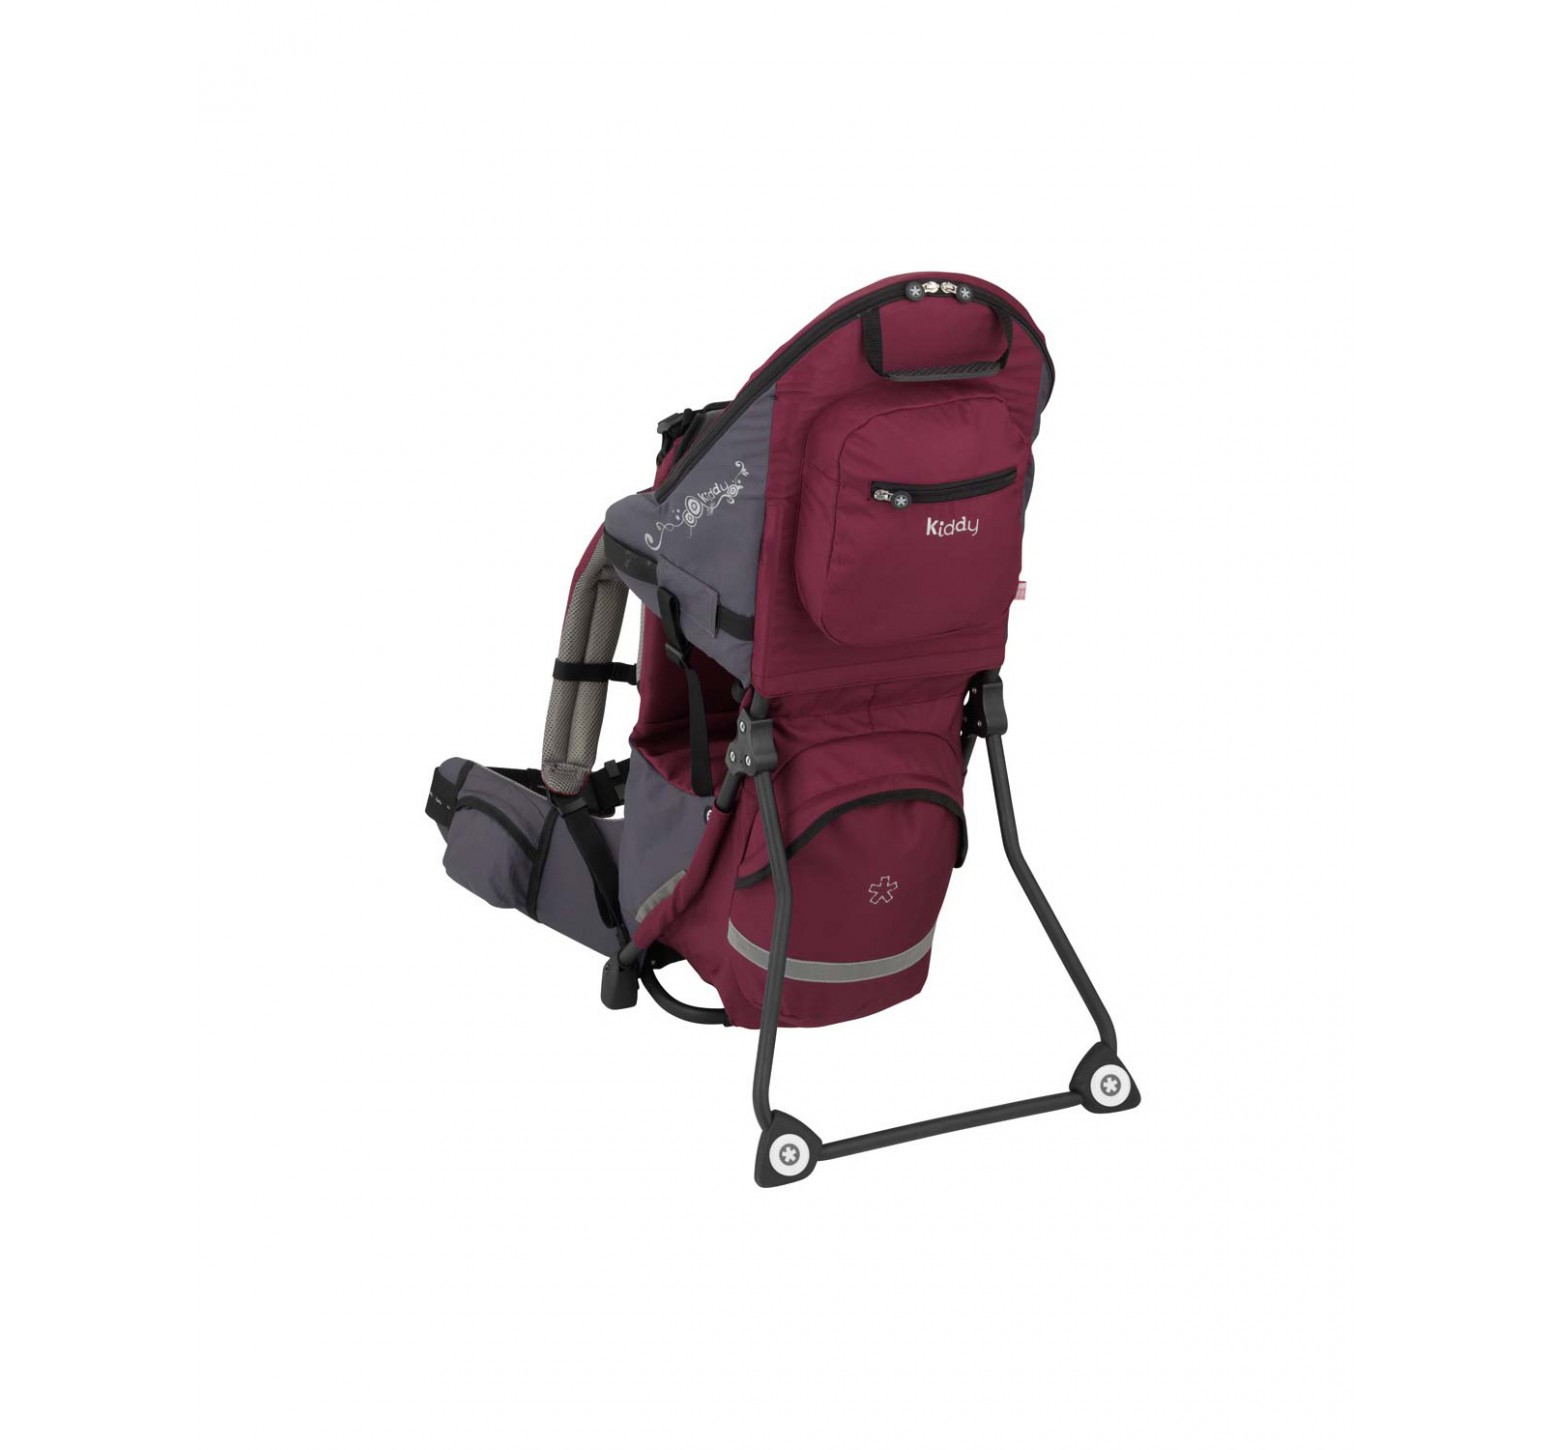 Kiddy Adventure Pack Child Carrier - Mochila trasportadora bordó